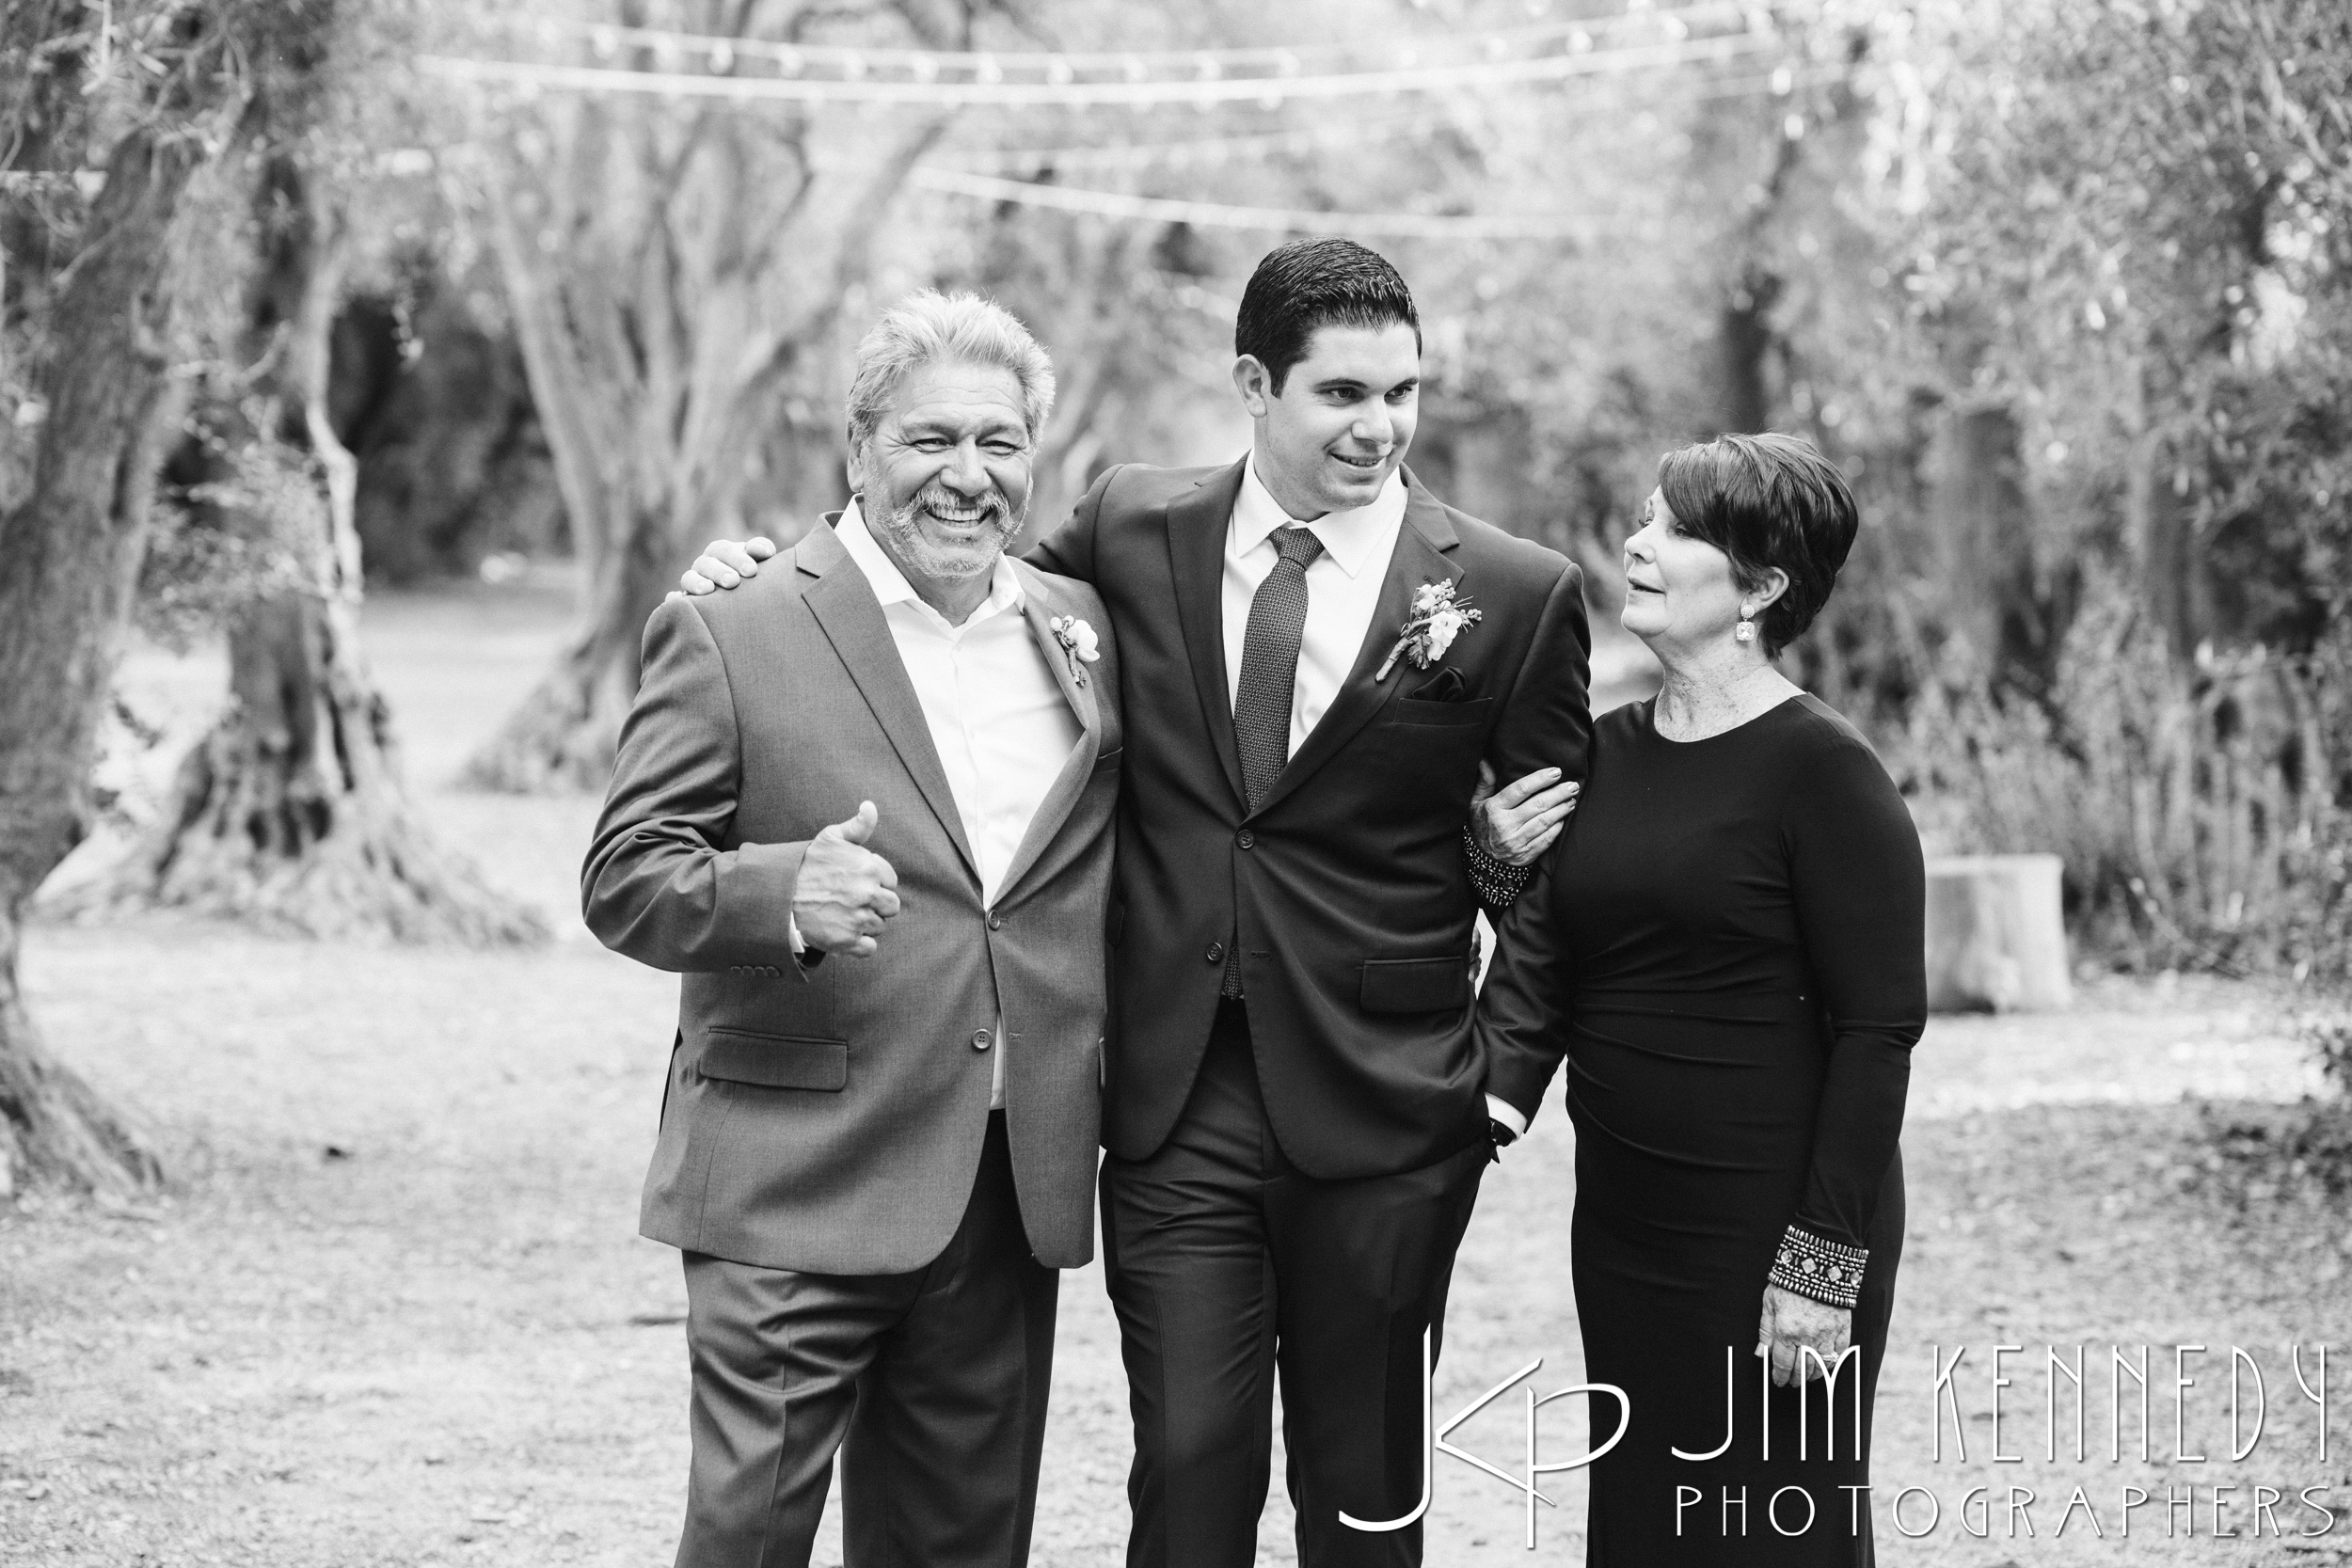 jim_kennedy_photographers_highland_springs_wedding_caitlyn_0092.jpg